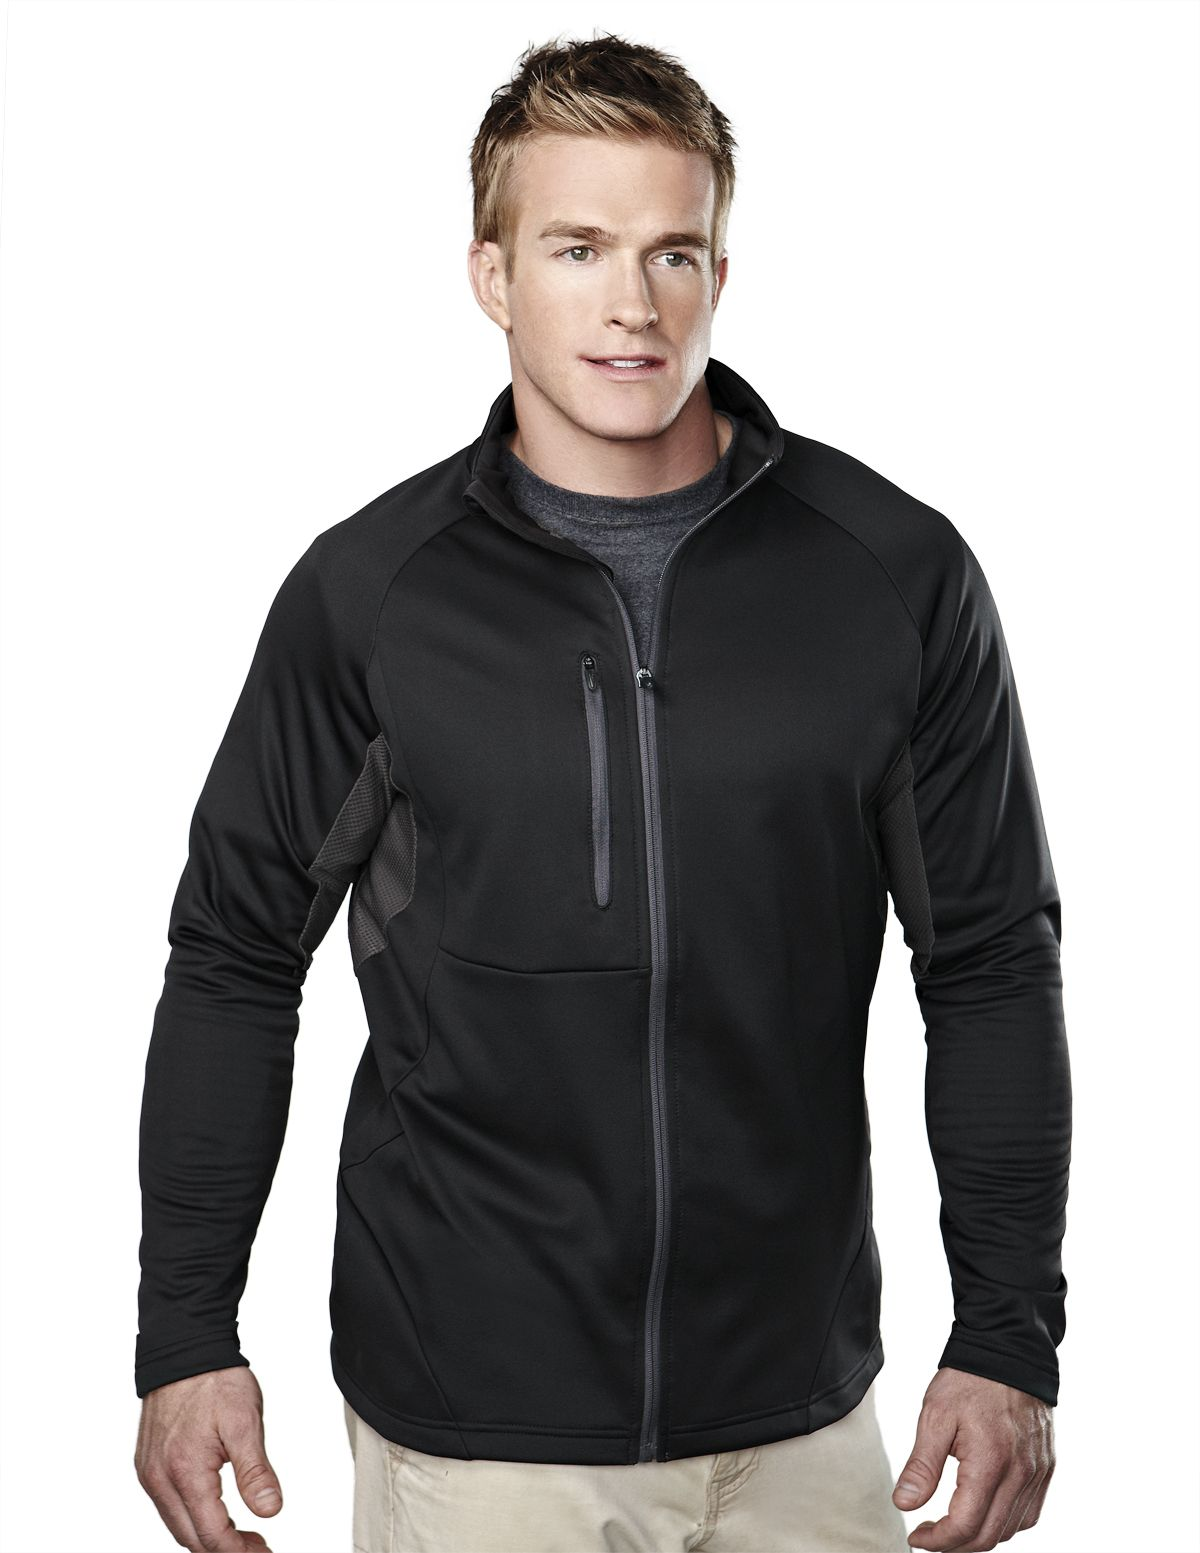 Men's Fleece Long Sleeve Jacket (100% Polyester). Tri mountain 7359 #Jacket #Fleece #Polyester